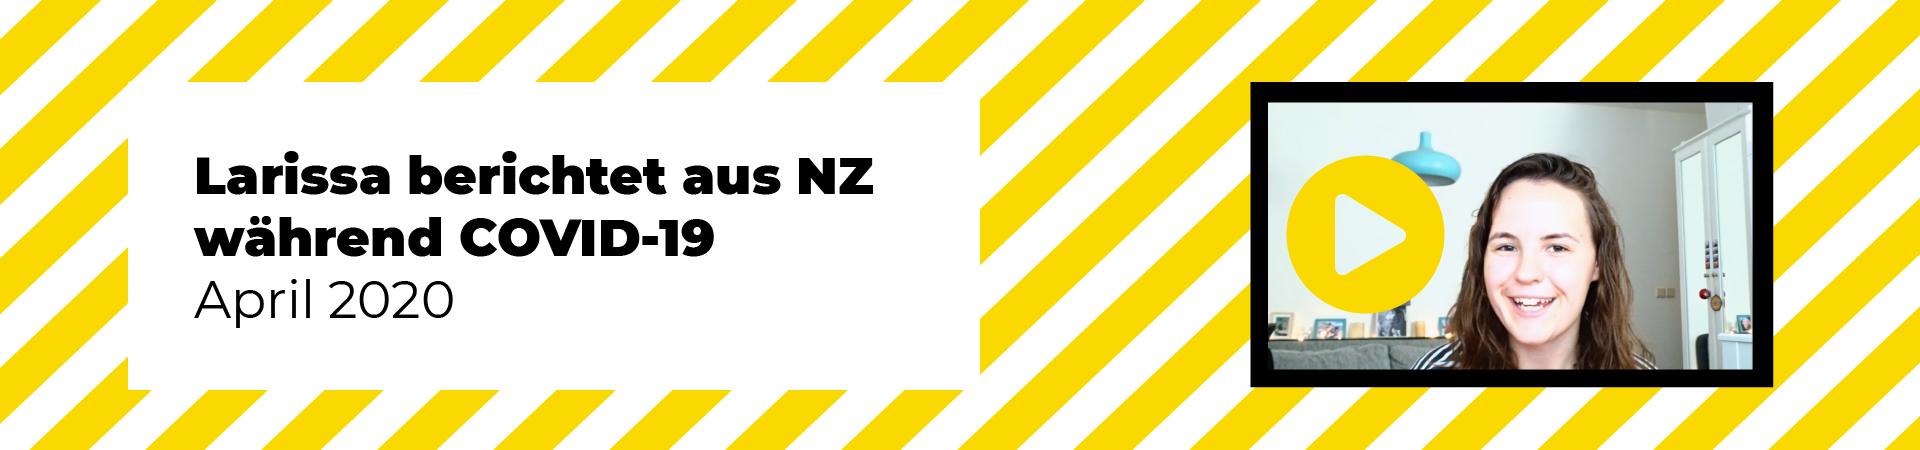 Larissa berichted aus Neuseeland während COVID-19 (April 2020)